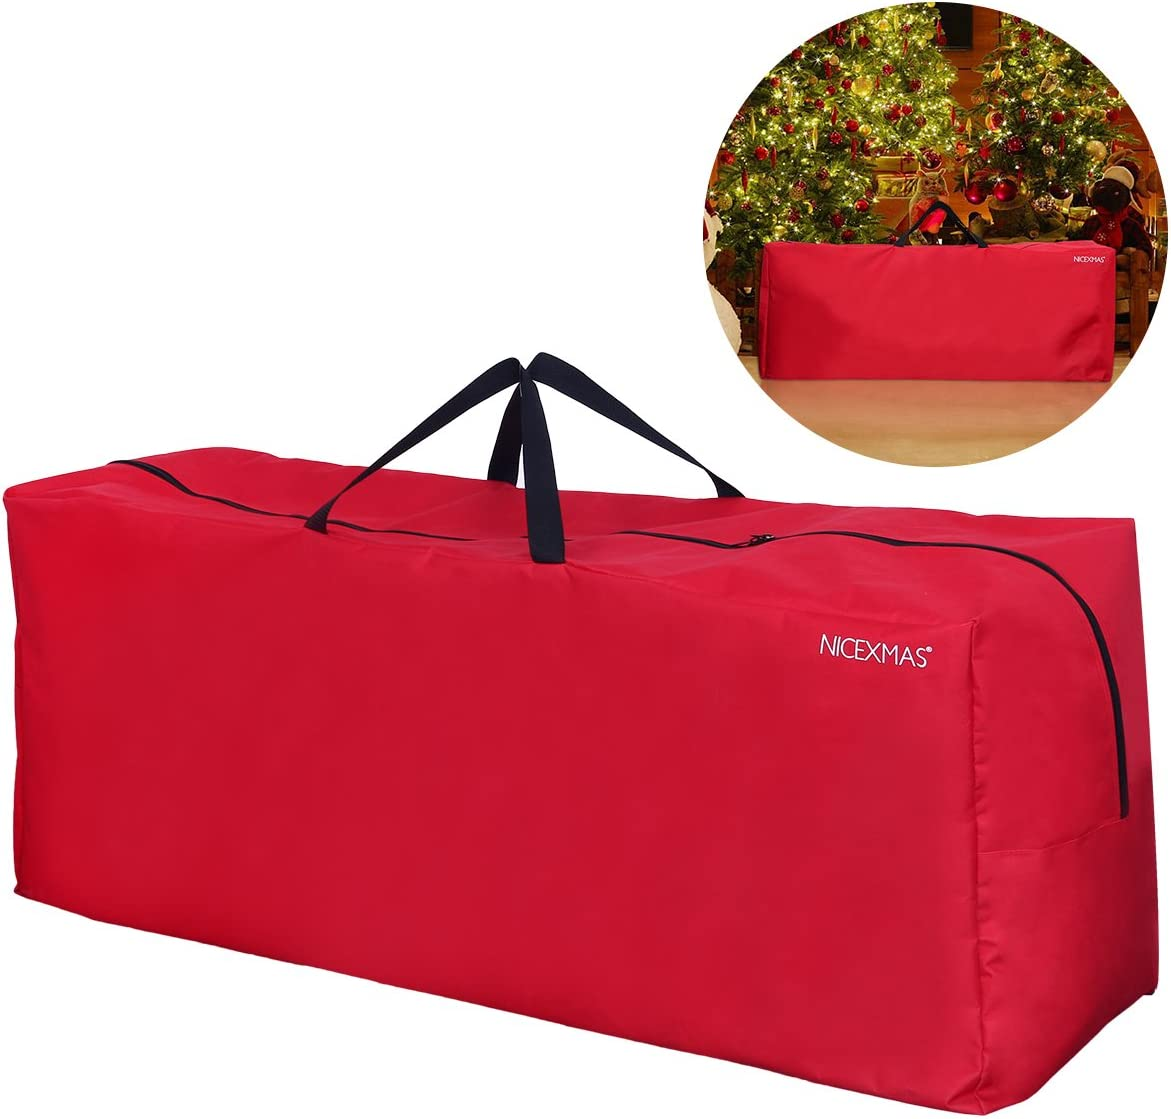 Green NICEXMAS 46*25*38cm borsa//custodia per albero di Natale